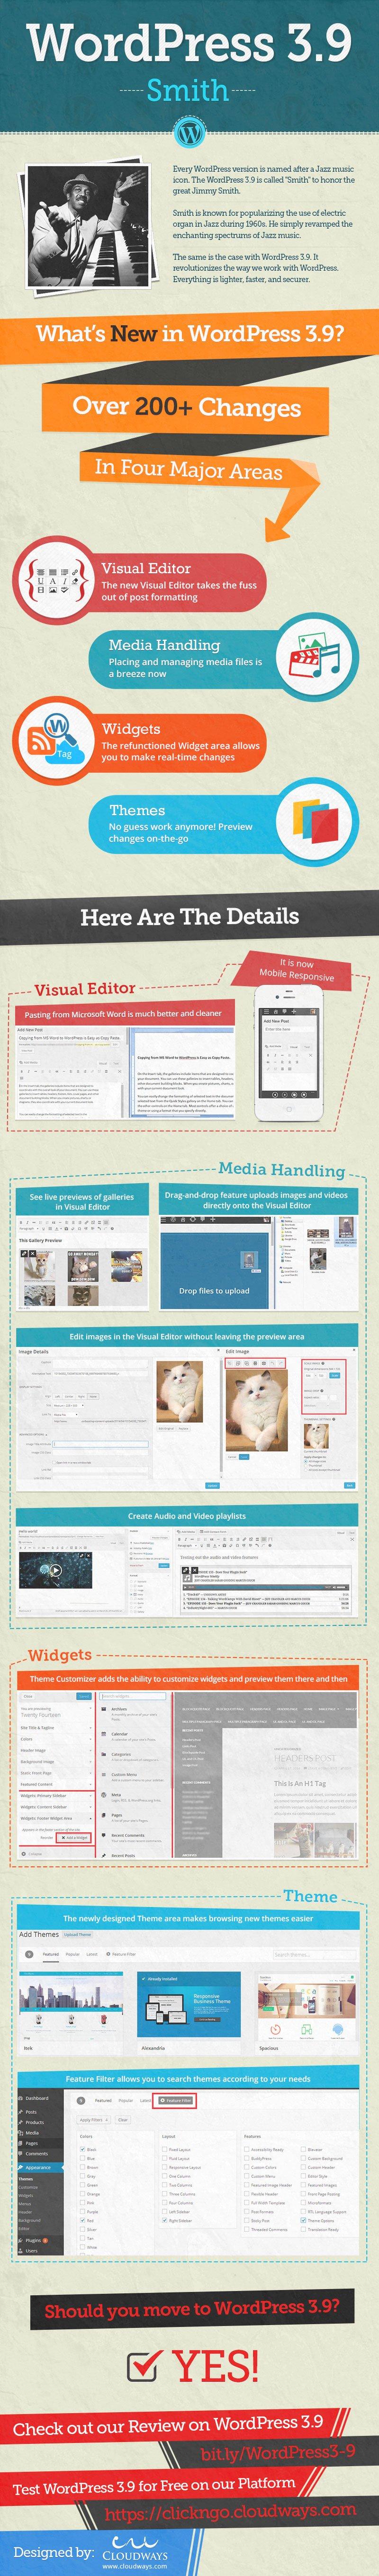 WordPress 3.9 infographic